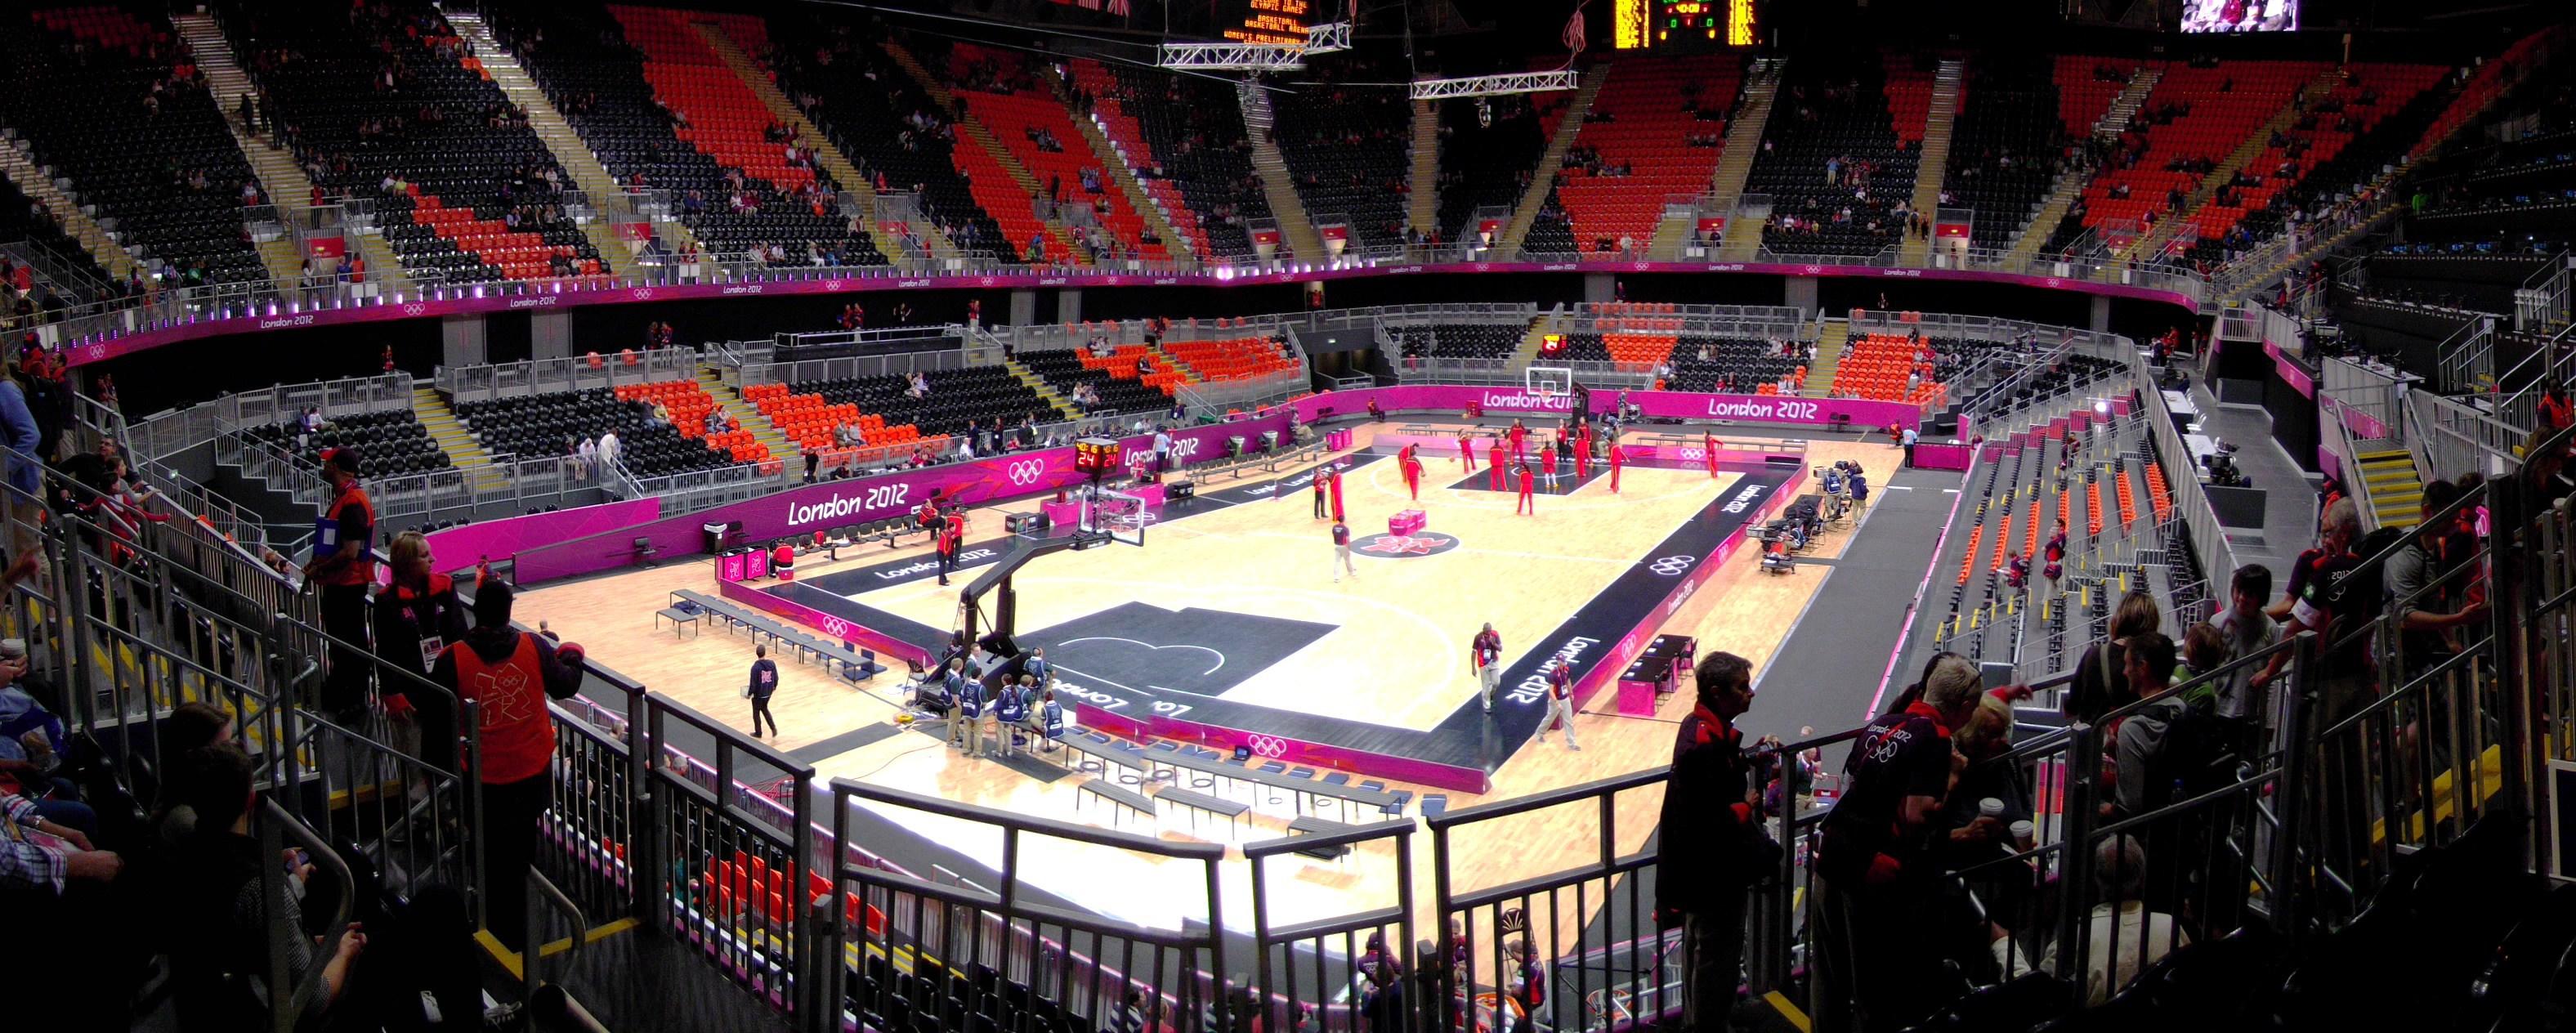 filebasketball arena london panoramajpg wikimedia